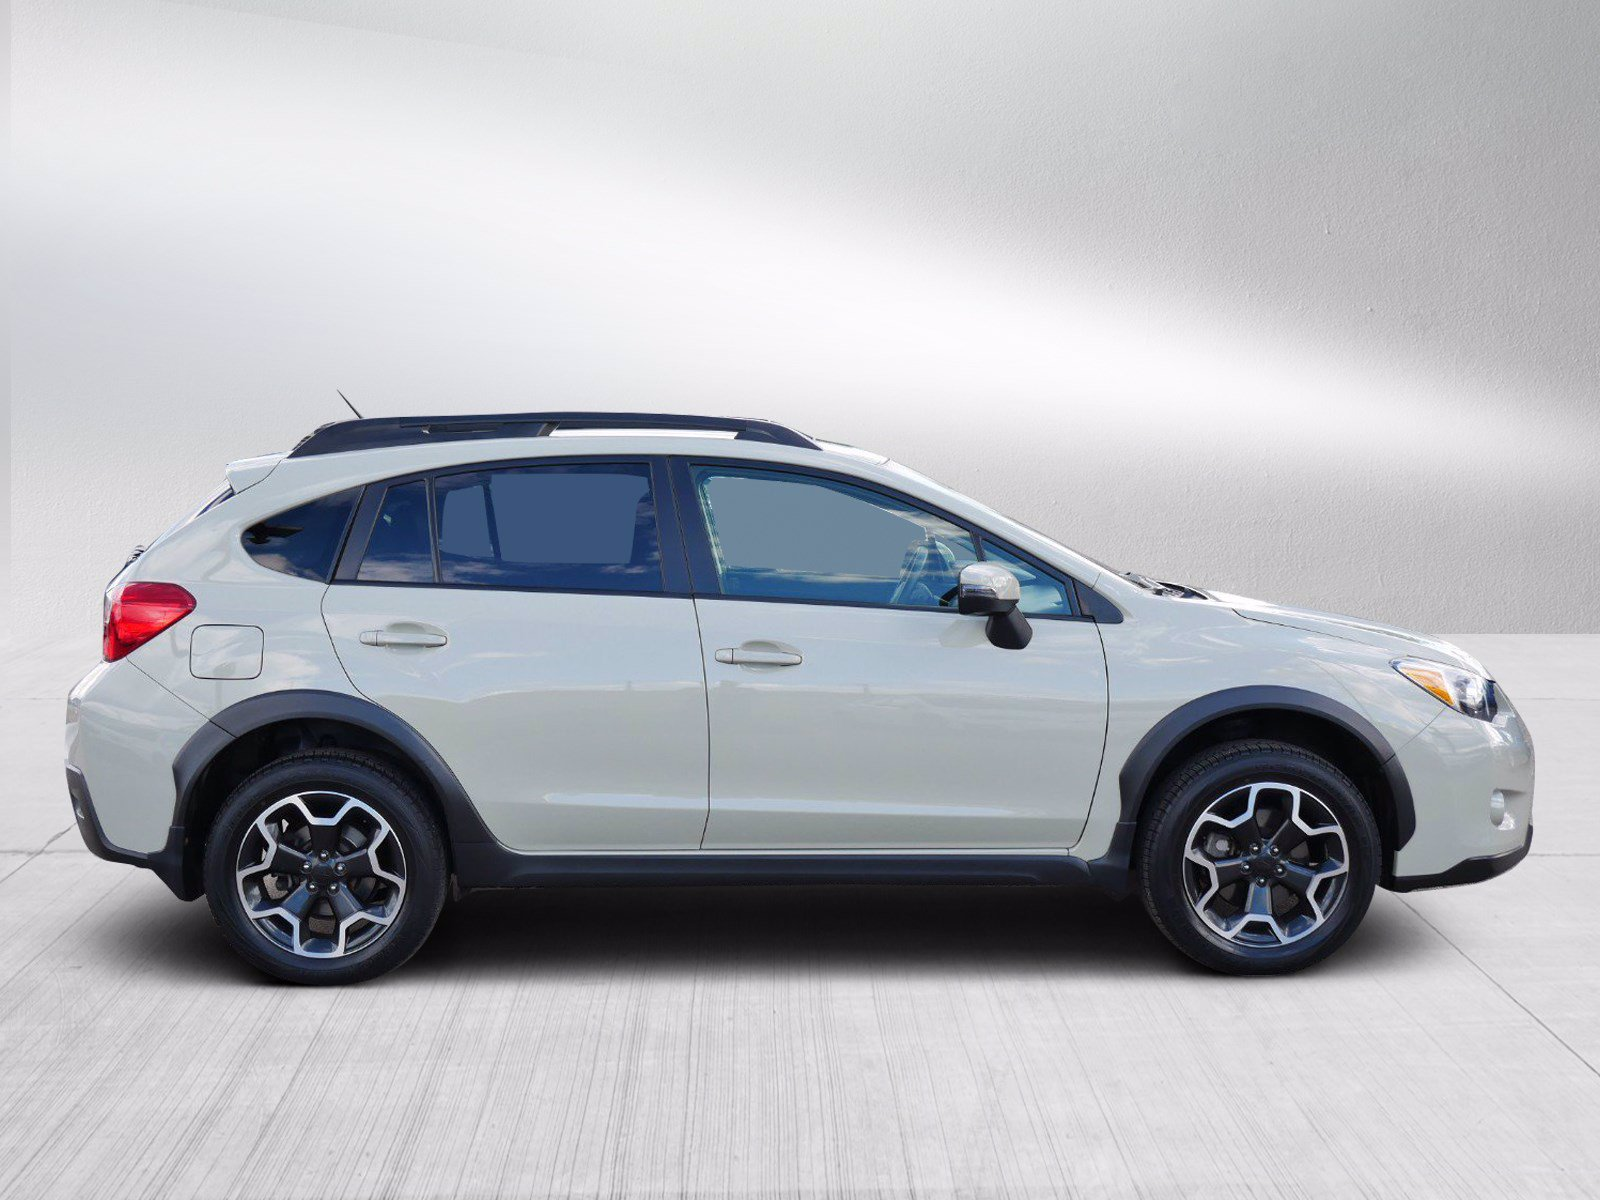 Used 2015 Subaru XV Crosstrek Limited with VIN JF2GPAMC1F8243560 for sale in Bloomington, Minnesota